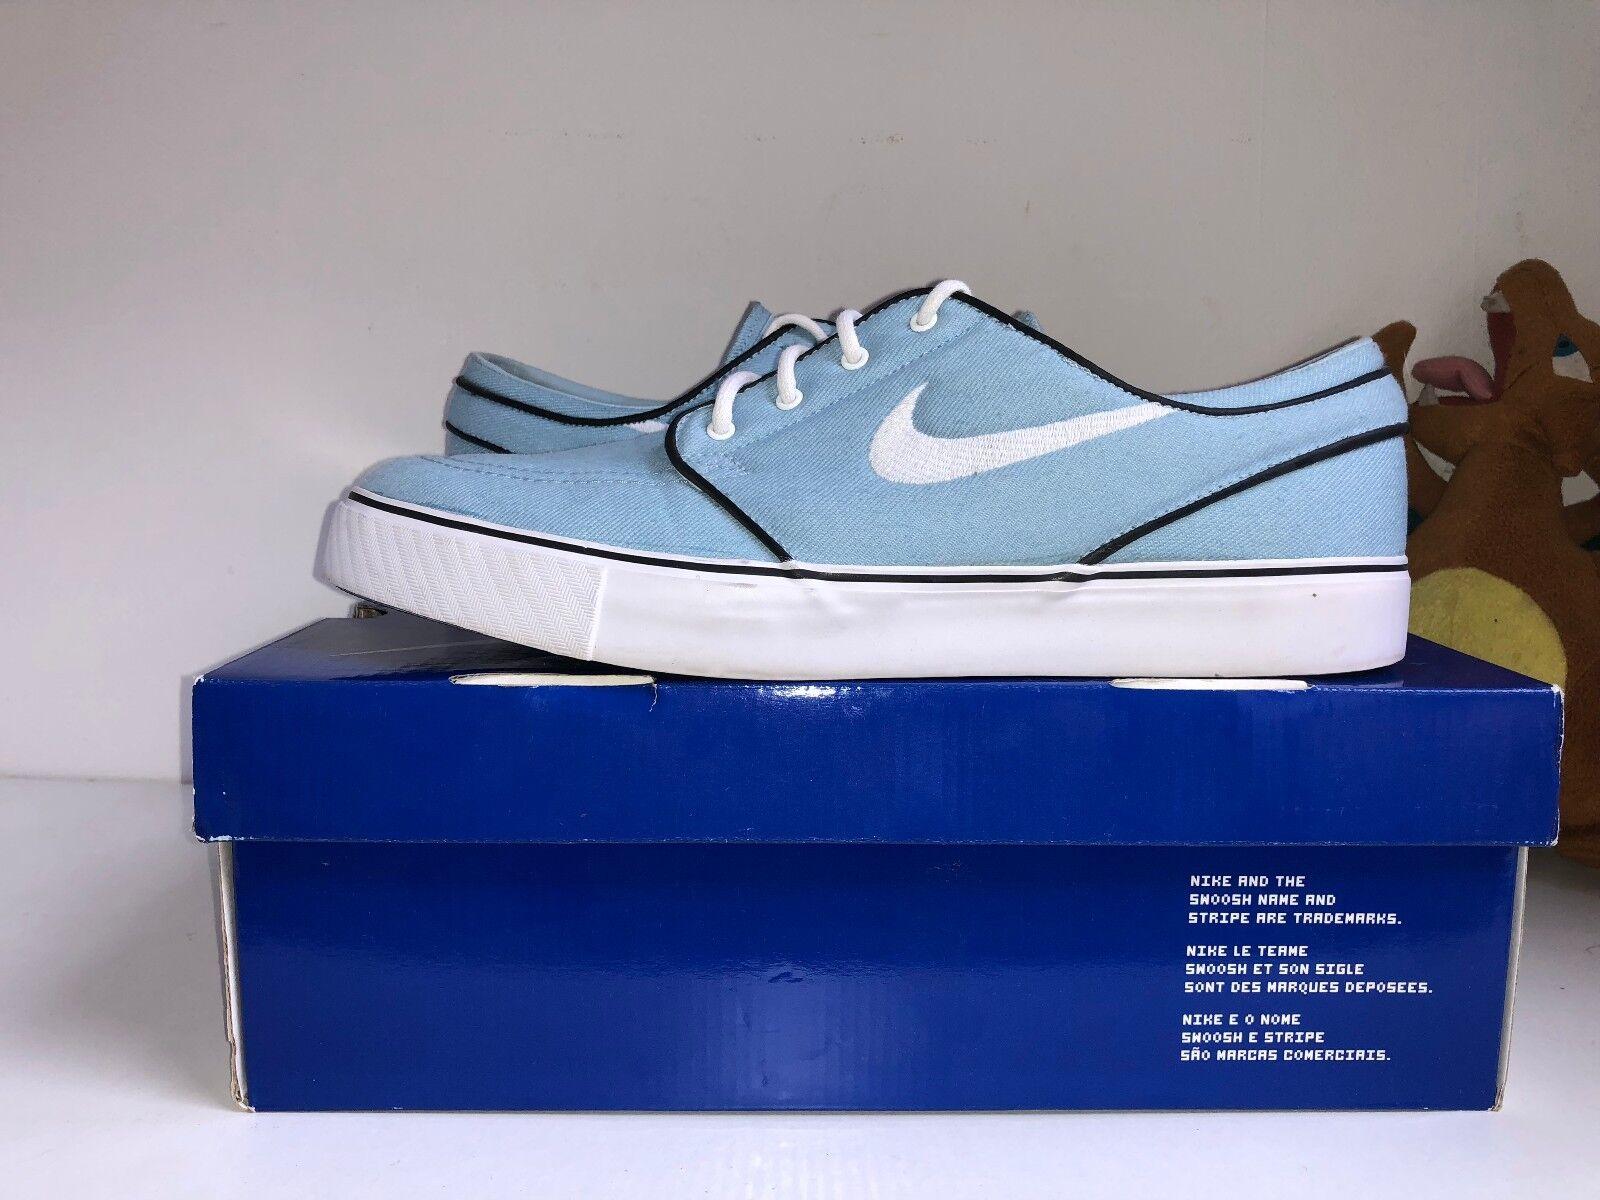 Nike Stefan Janoski Entrenadores  Suave Azul/Blanco [US 10.5  Entrenadores ] c90724